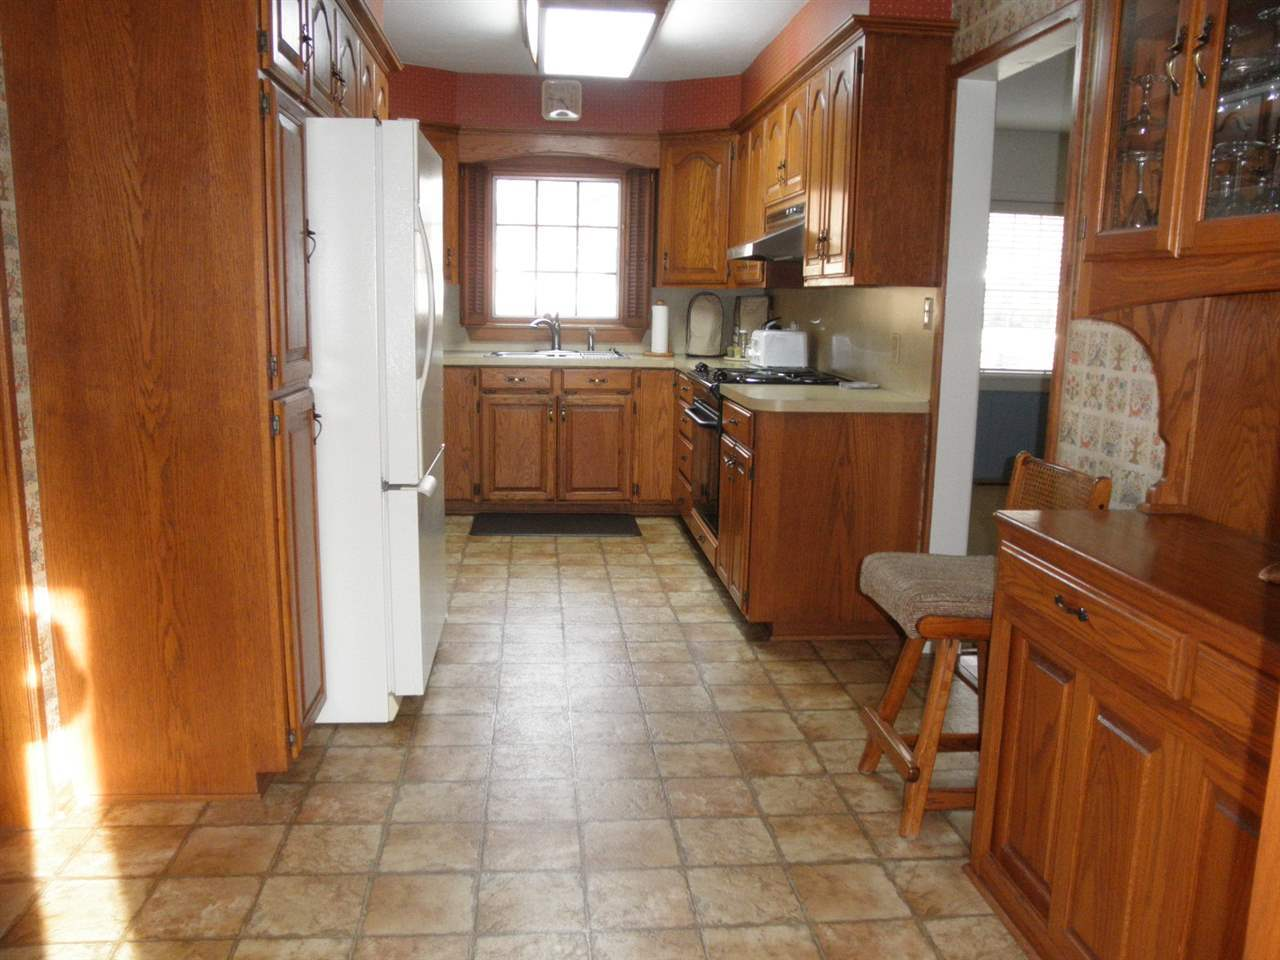 Sold Cross Sale W/ MLS | 88 Elmwood  Ponca City, OK 74601 11